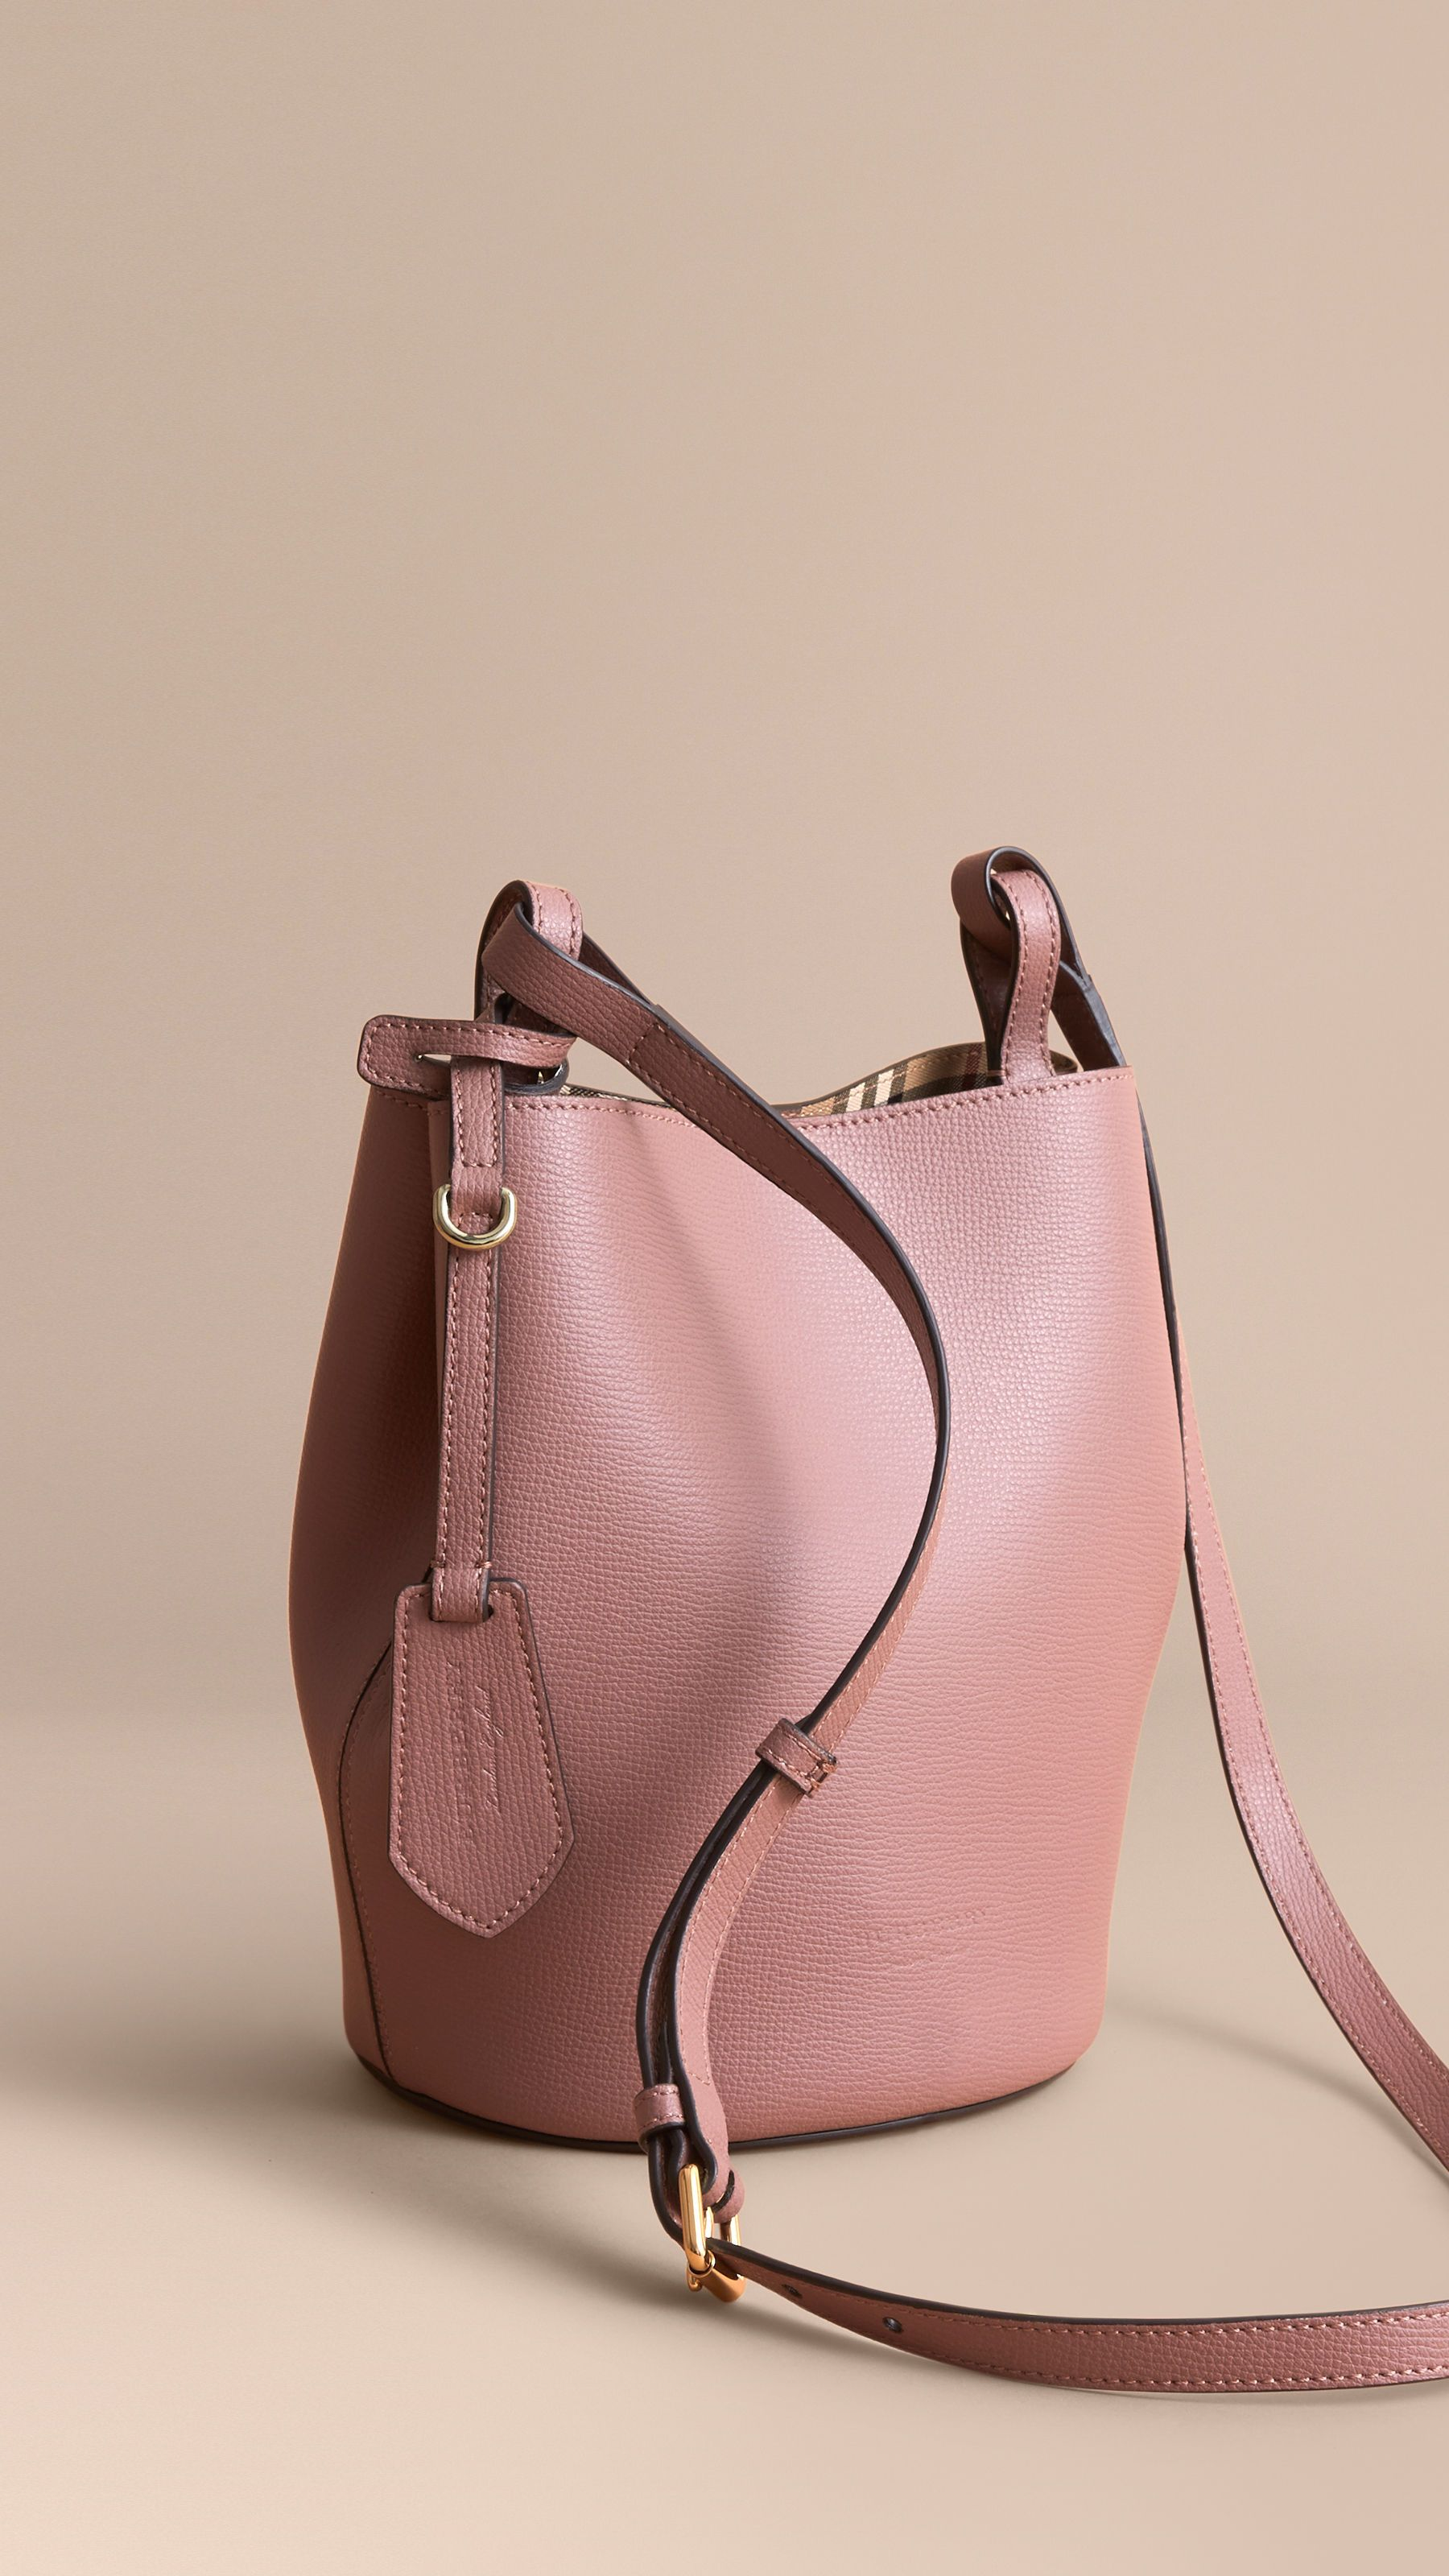 01b1d2b0de Leather and Haymarket Check Crossbody Bucket Bag Light Elderberry | Burberry  Canada